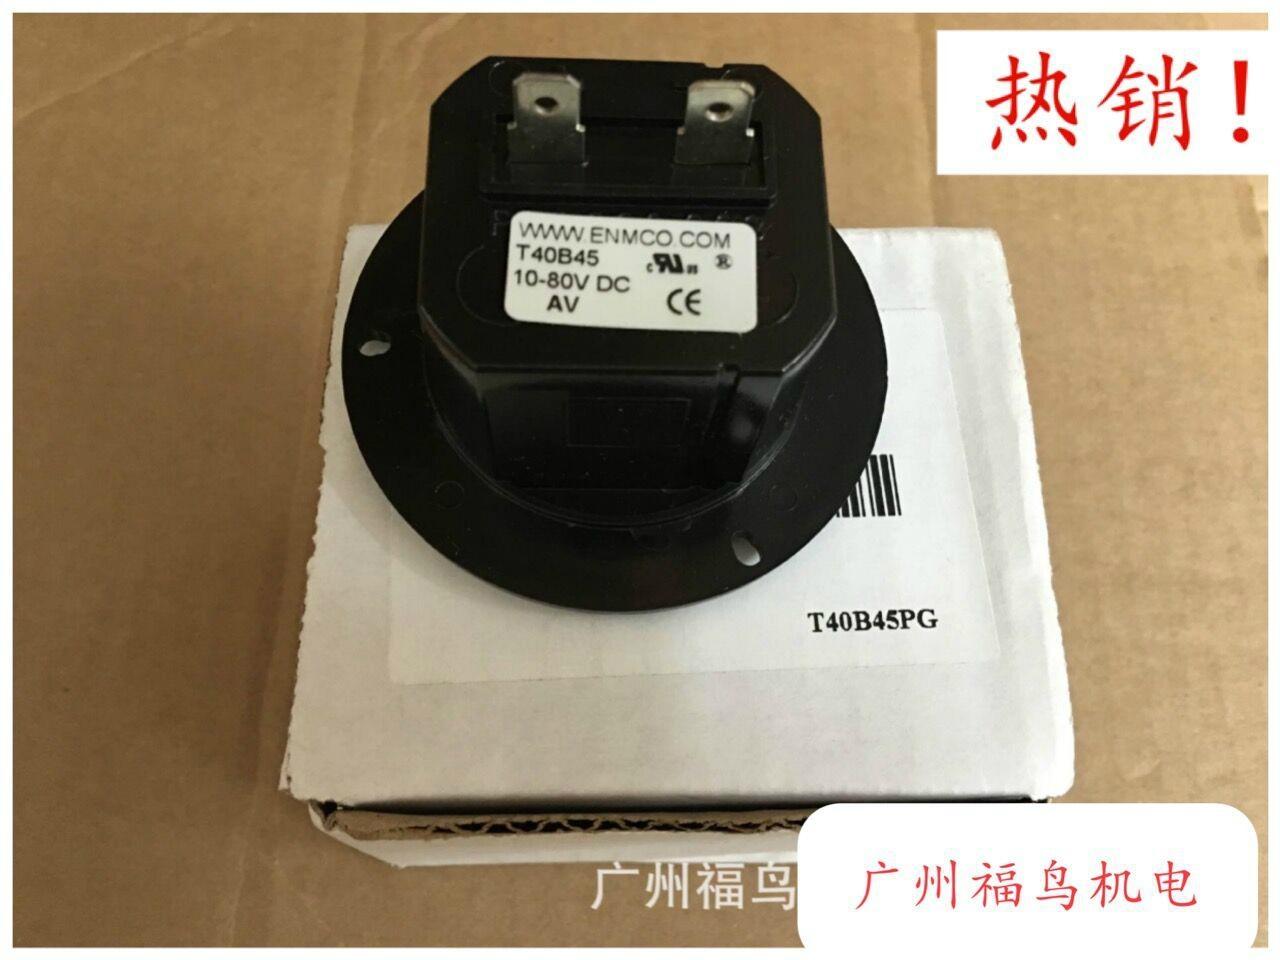 ENM计时器, 型号: T40B45